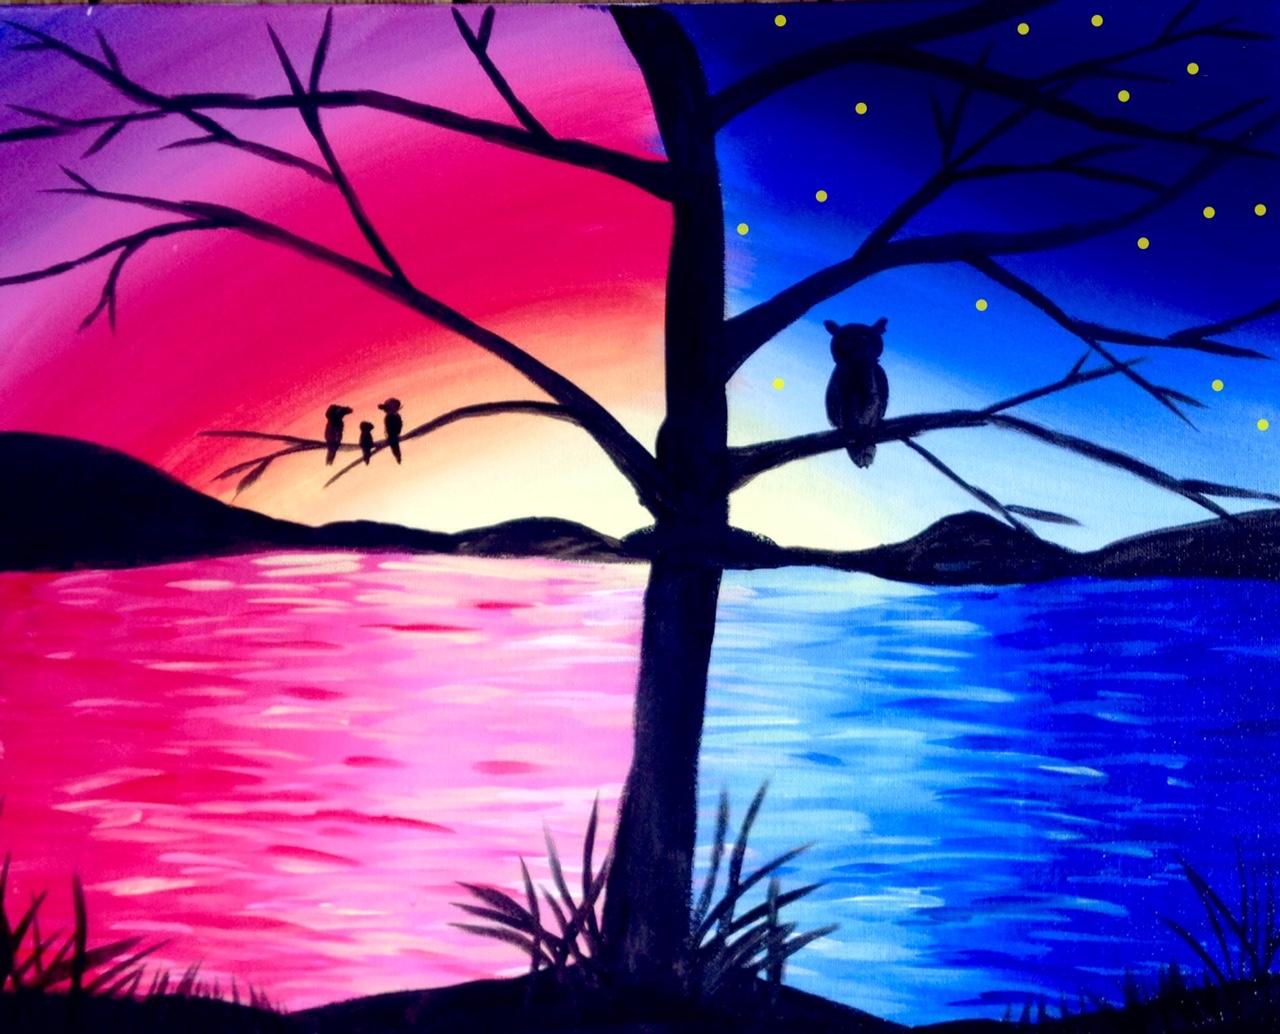 Paisajes Para Dibujar A Color Faciles: Picante - Chantilly 02/24/2015